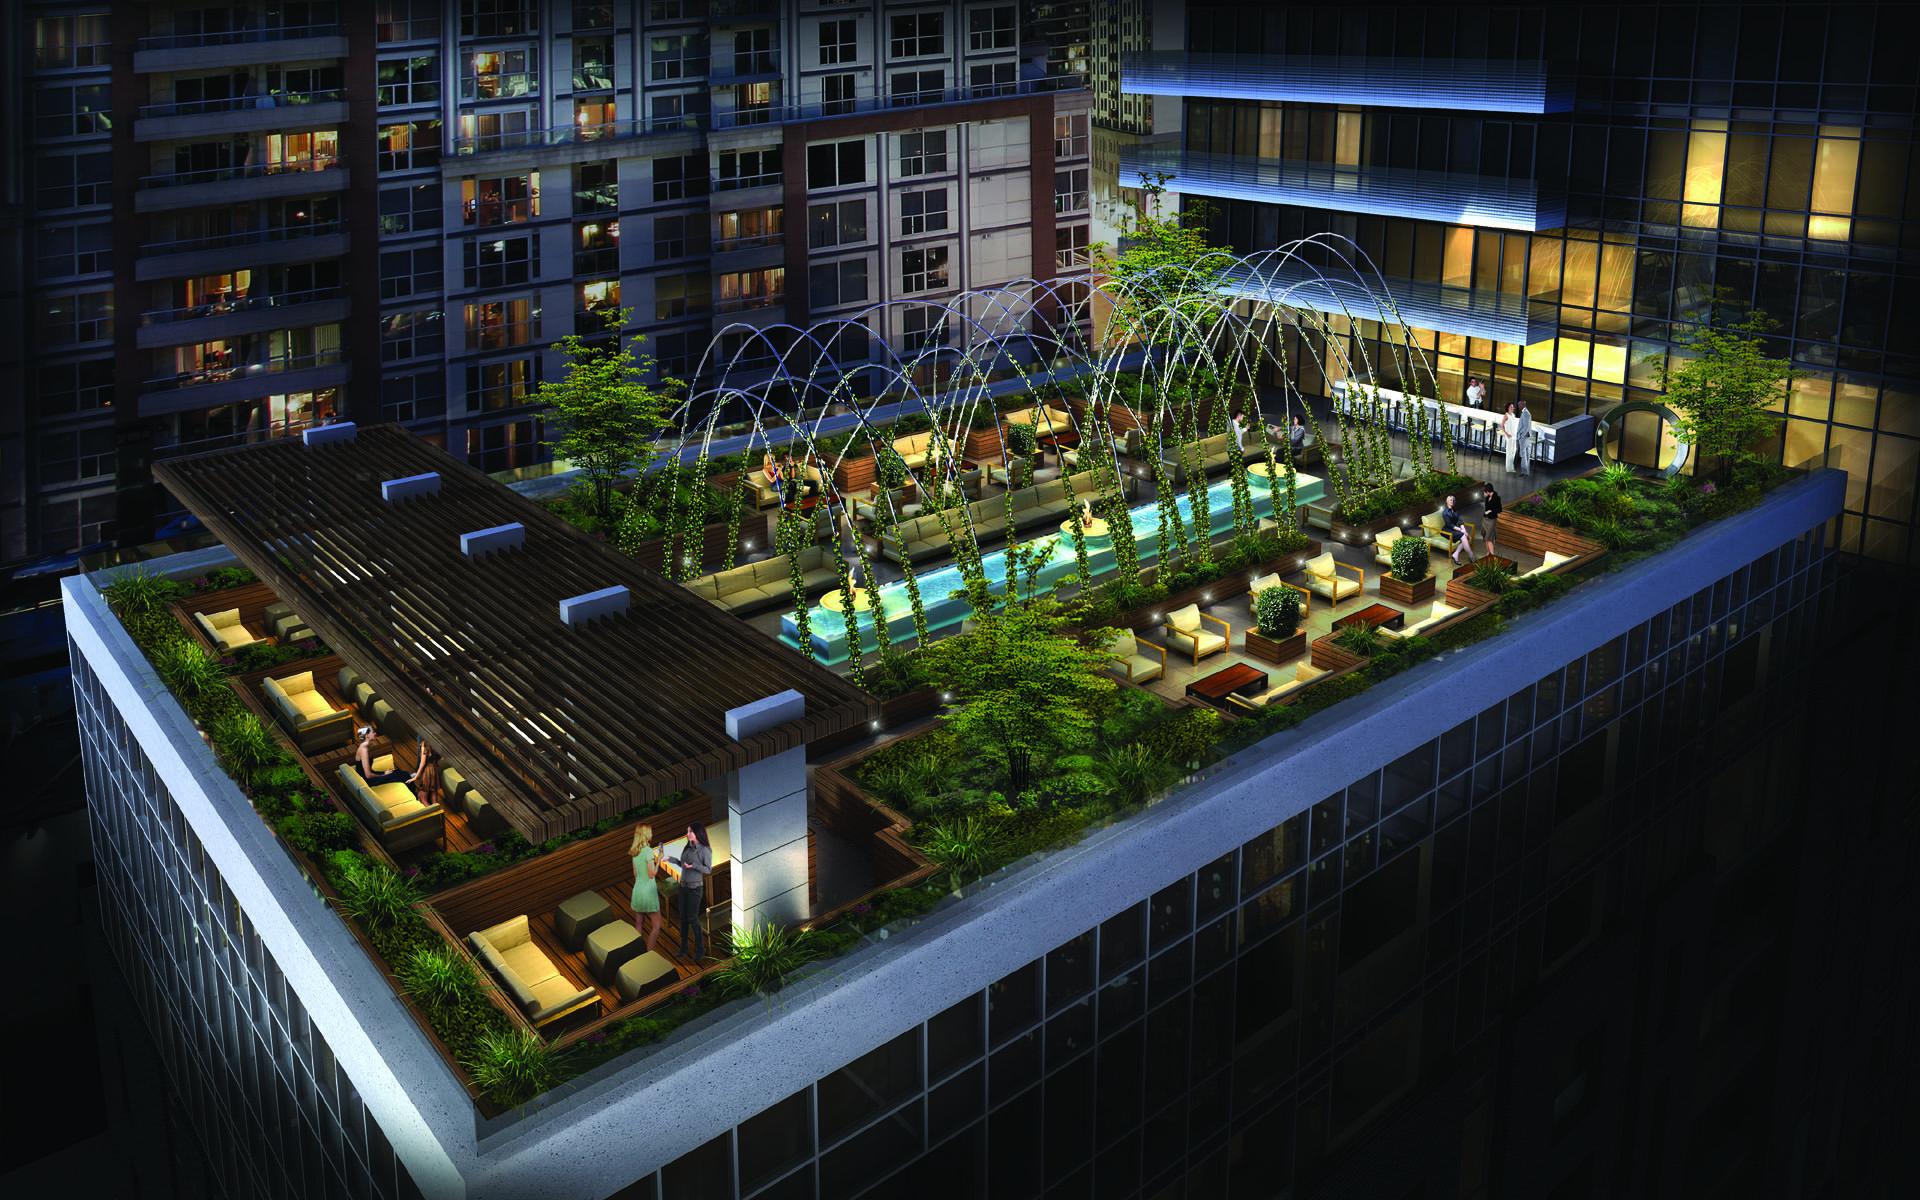 King Blue Condominiums Brings Urban Refinement to King Street West